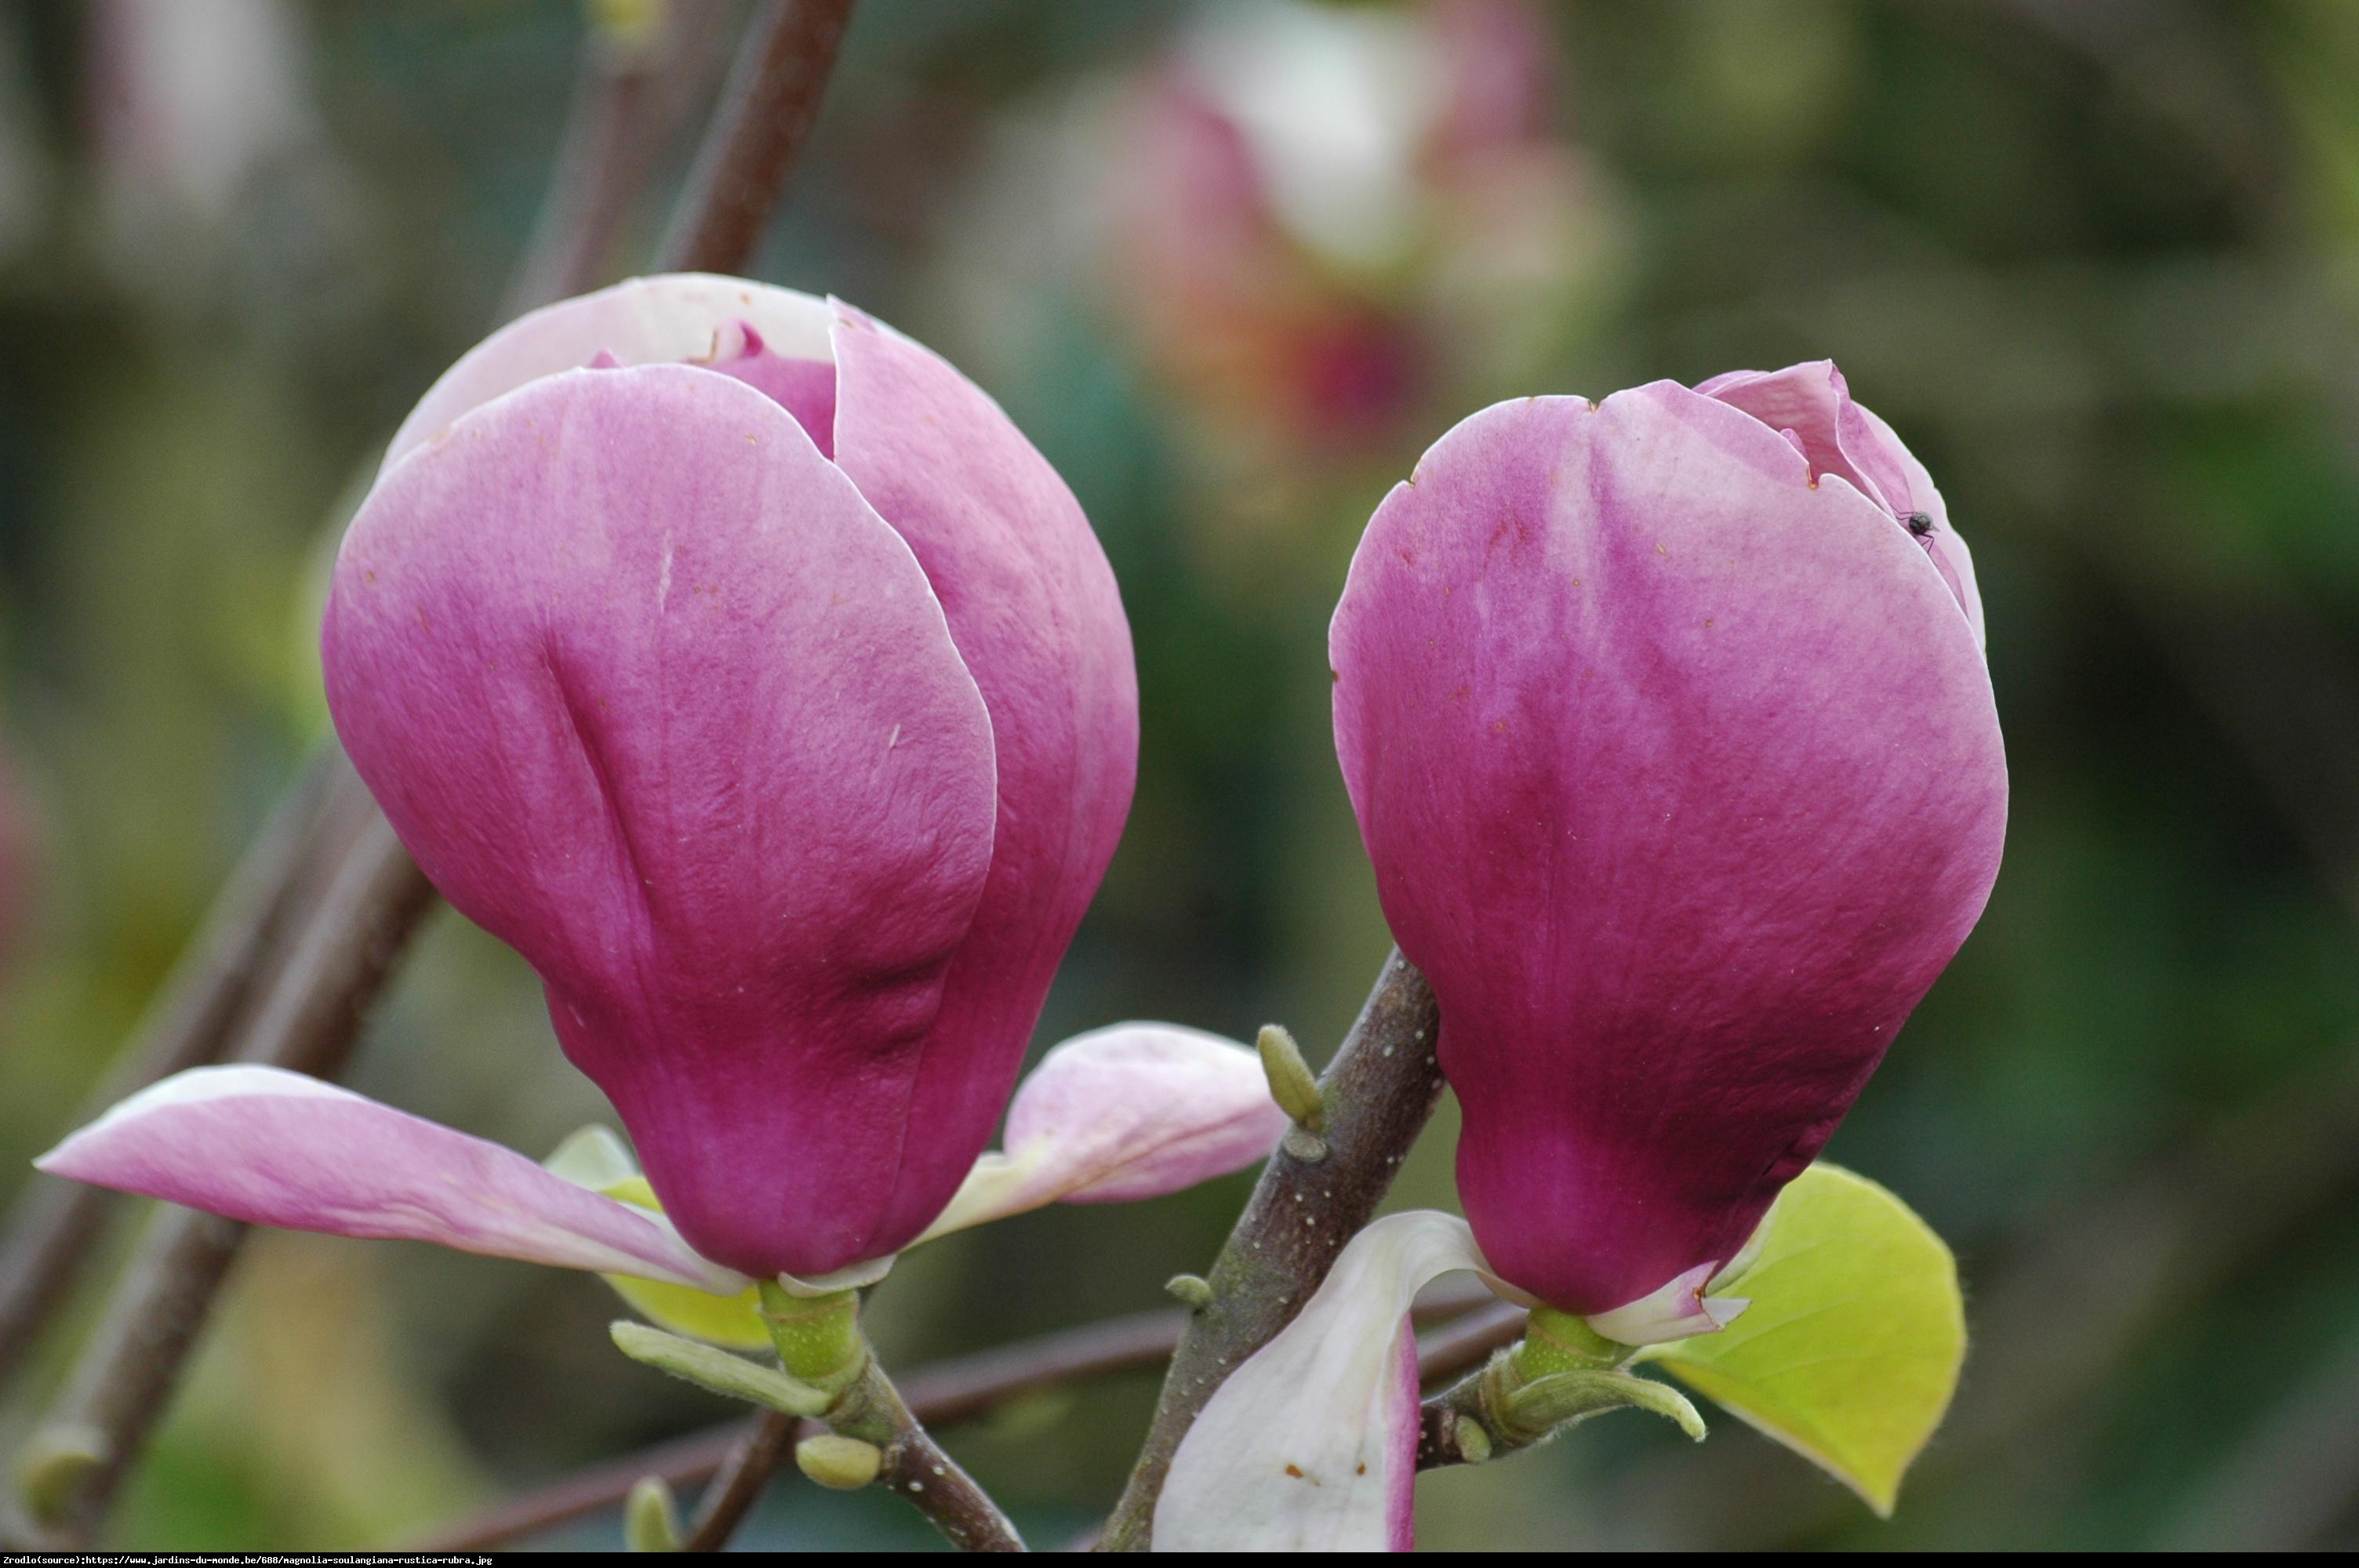 Magnolia pośrednia Rustica Rubra - Magnolia Rustica Rubra